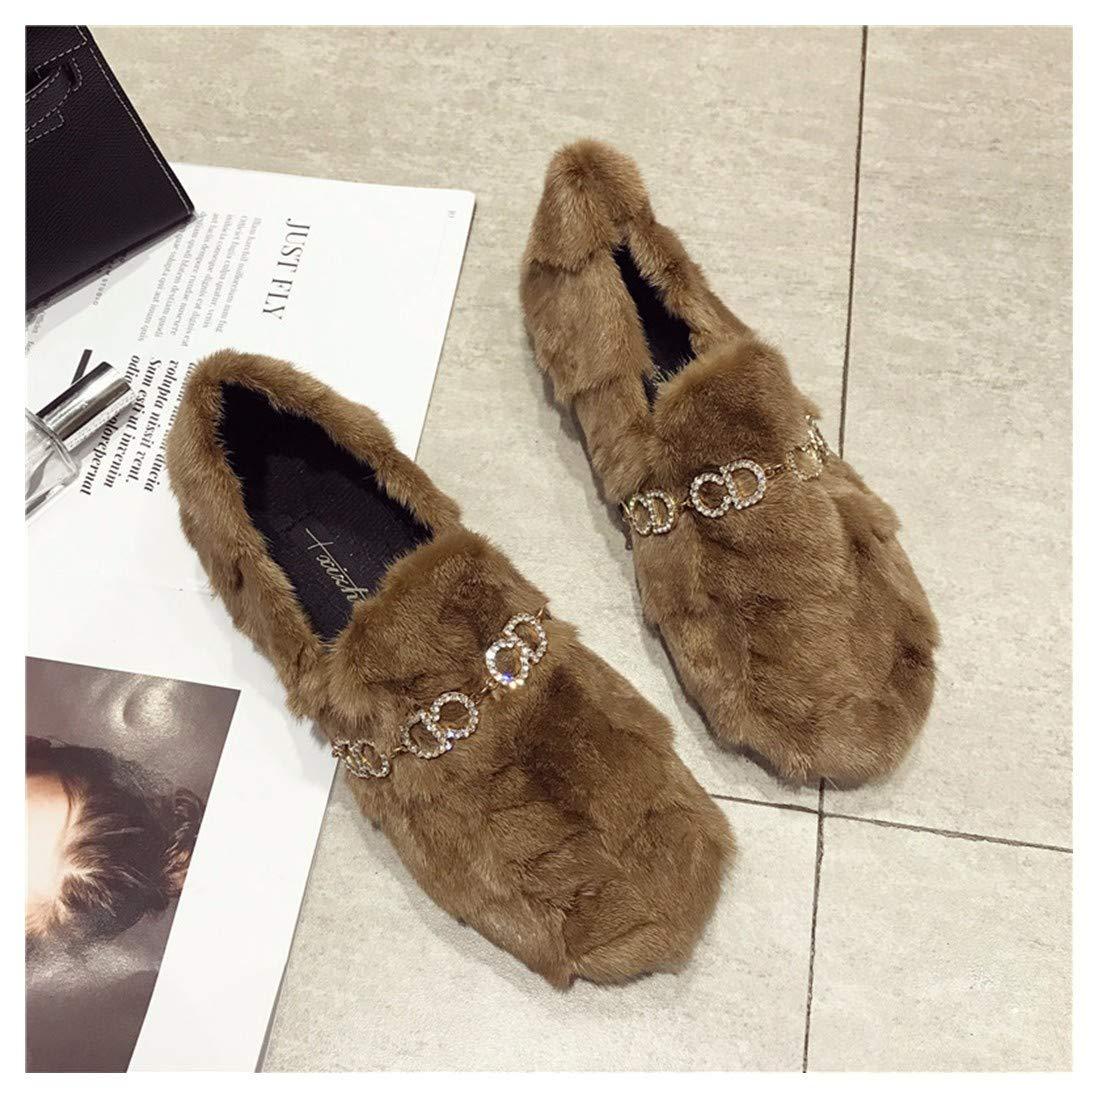 Camel OMFGOD Mesdames Fashion Chaussons Confort Fourrures Cuir Caoutchouc Fond Plat Chaussures De Loisirs